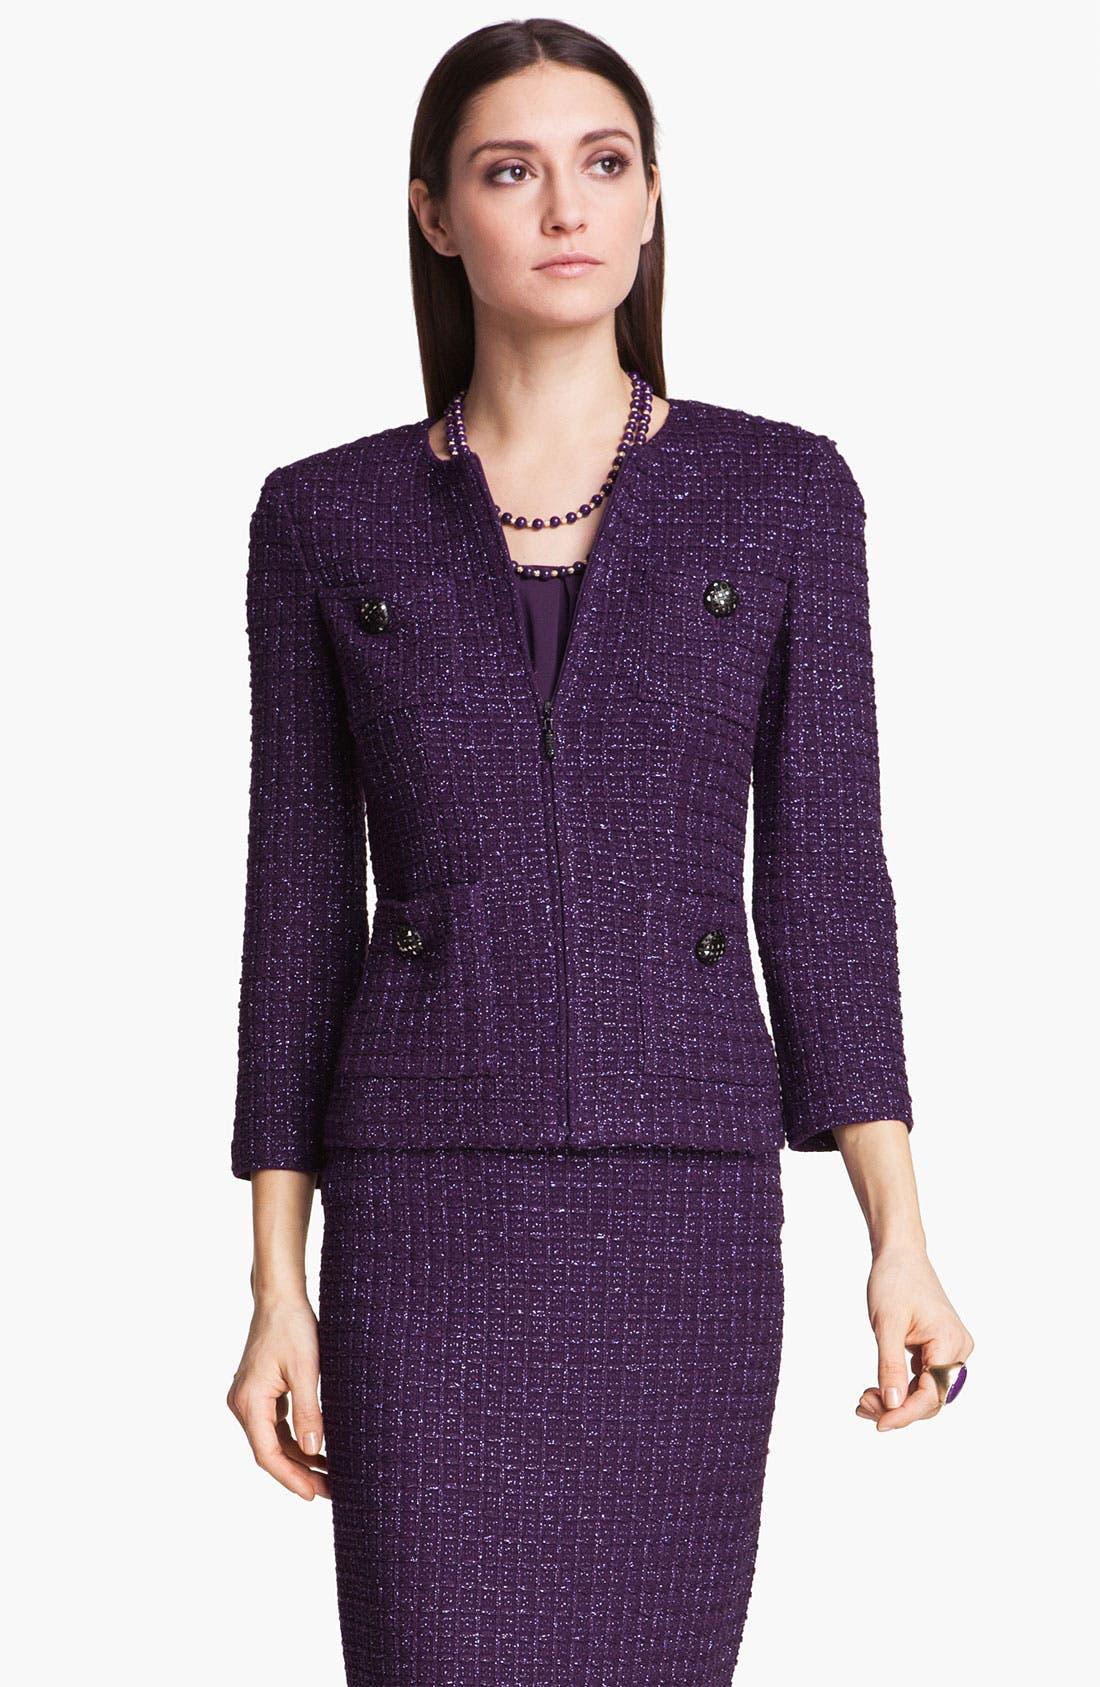 Main Image - St. John Collection Shimmer Tweed Jacket